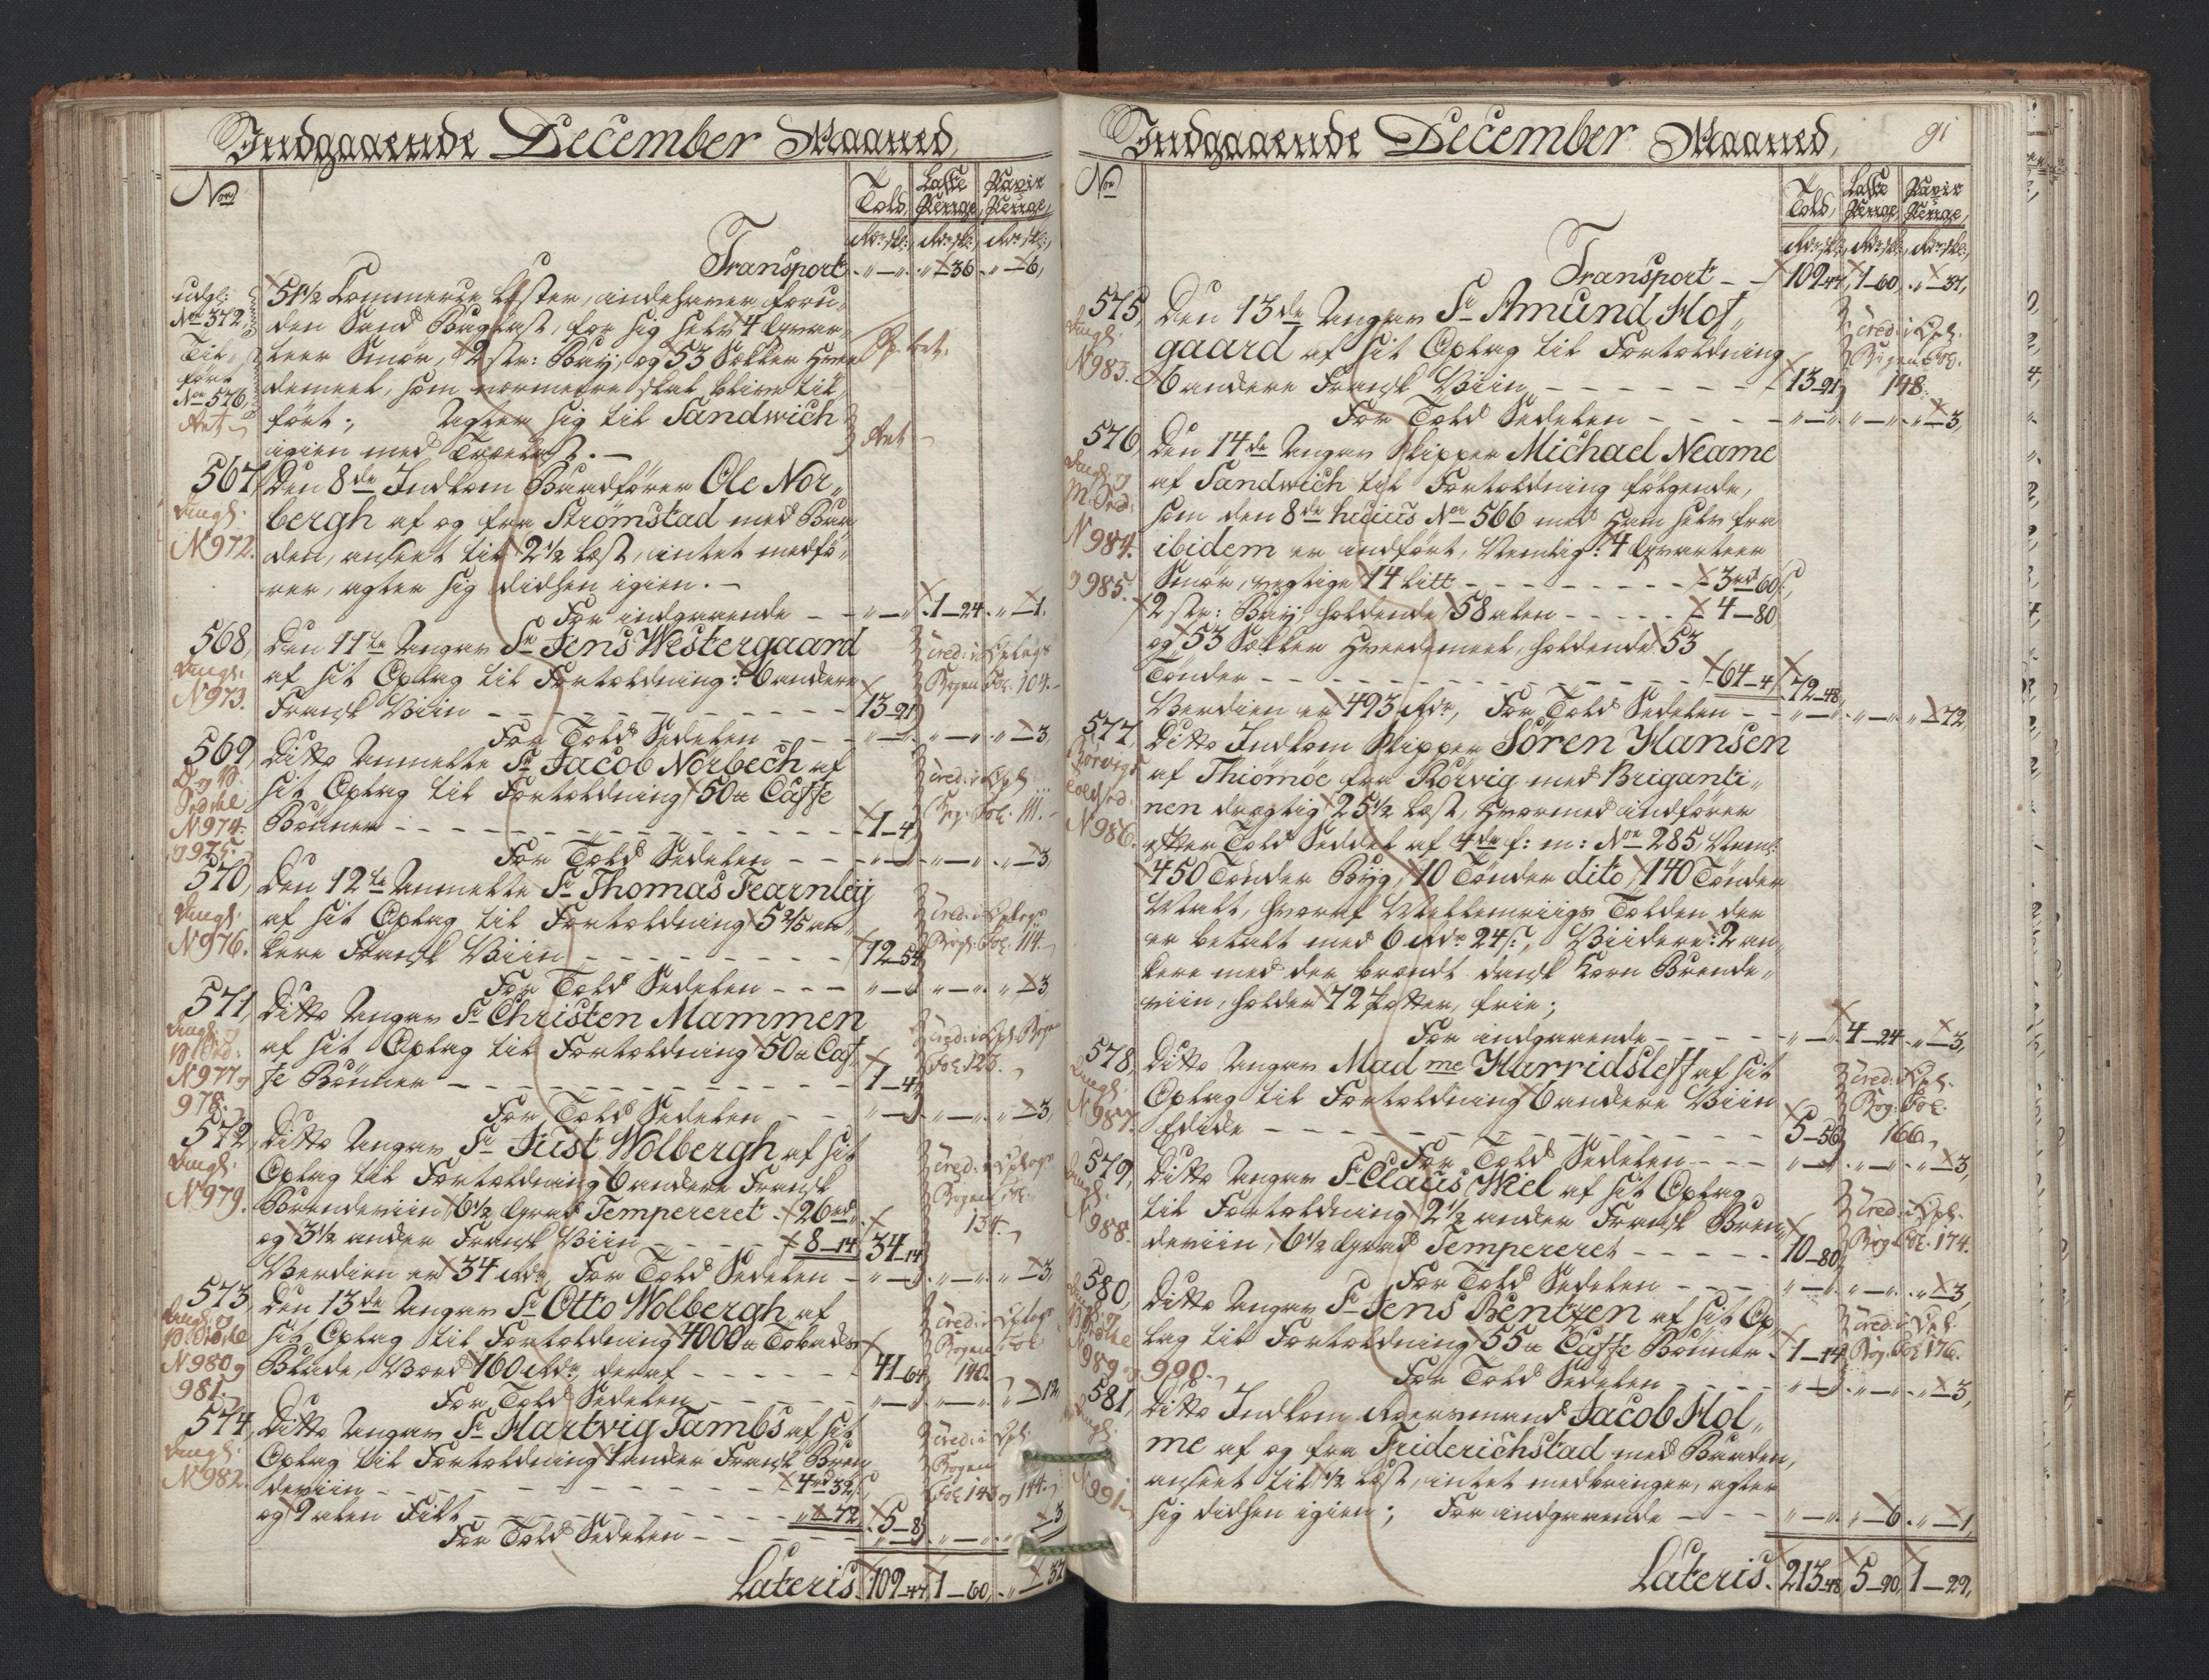 RA, Generaltollkammeret, tollregnskaper, R01/L0130: Tollregnskaper Fredrikshald, 1786, s. 90b-91a